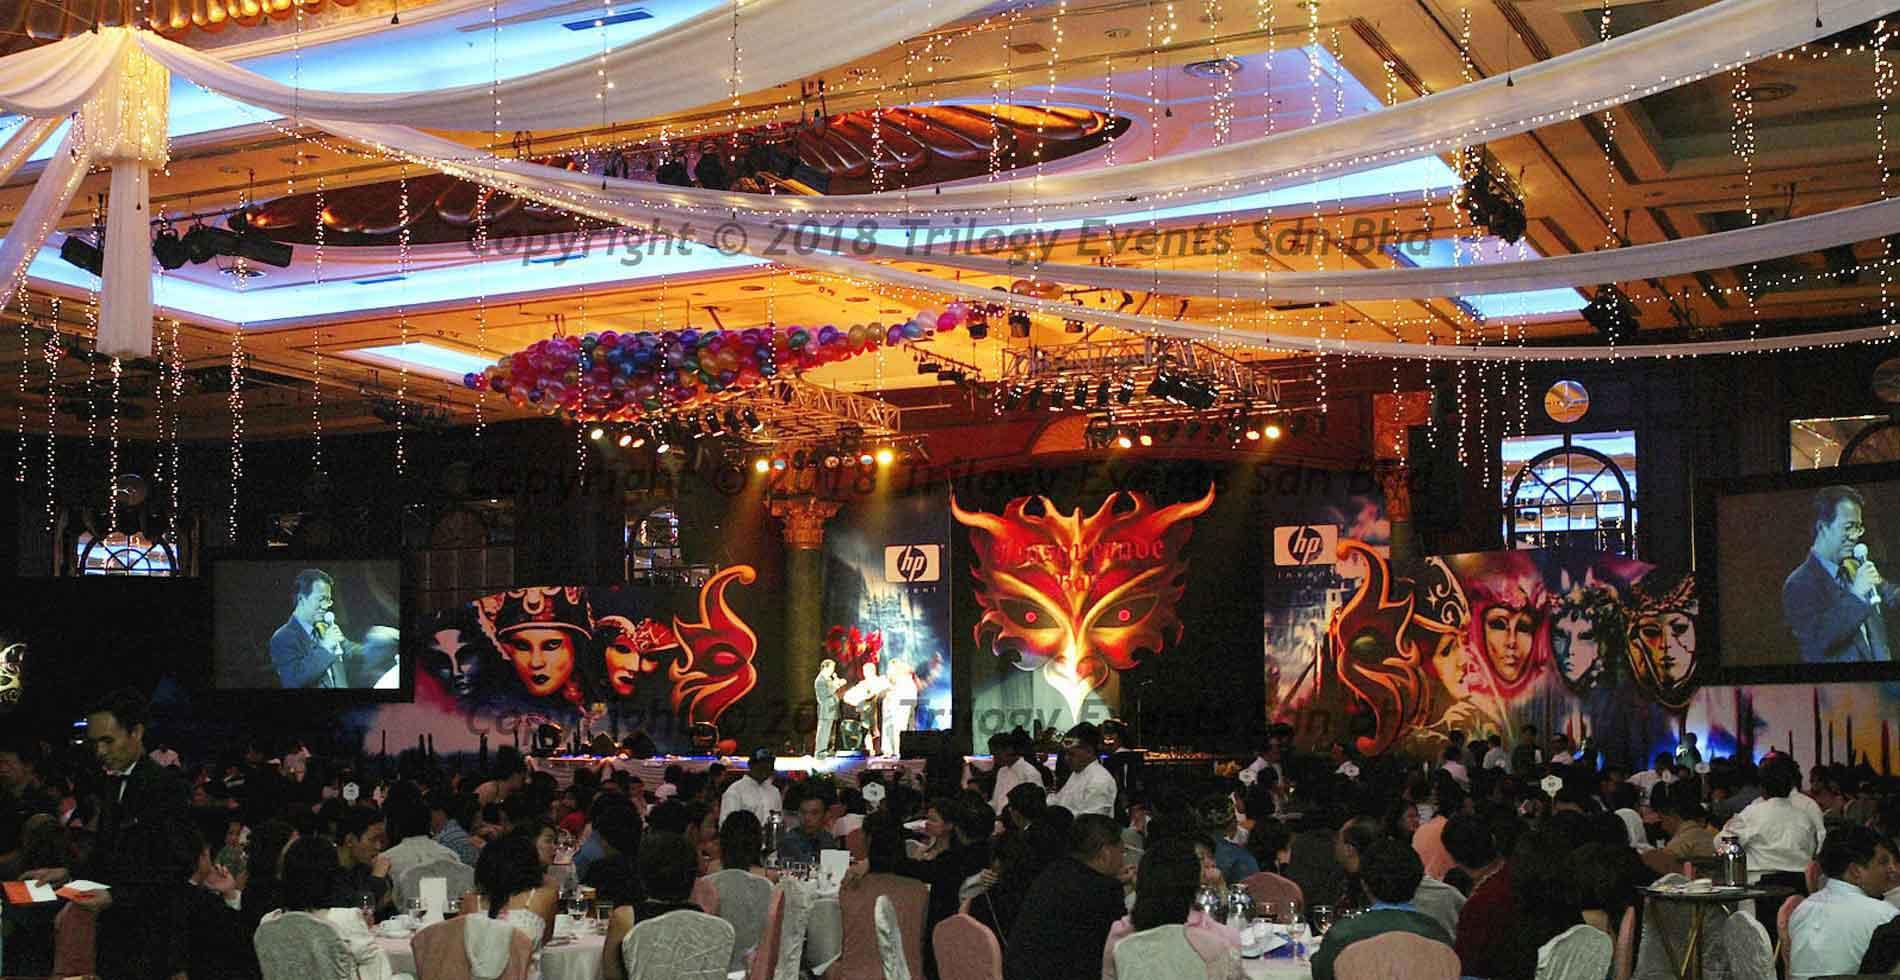 EVENTS SERVICES COMPANY IN KUALA LUMPUR, MALAYSIA